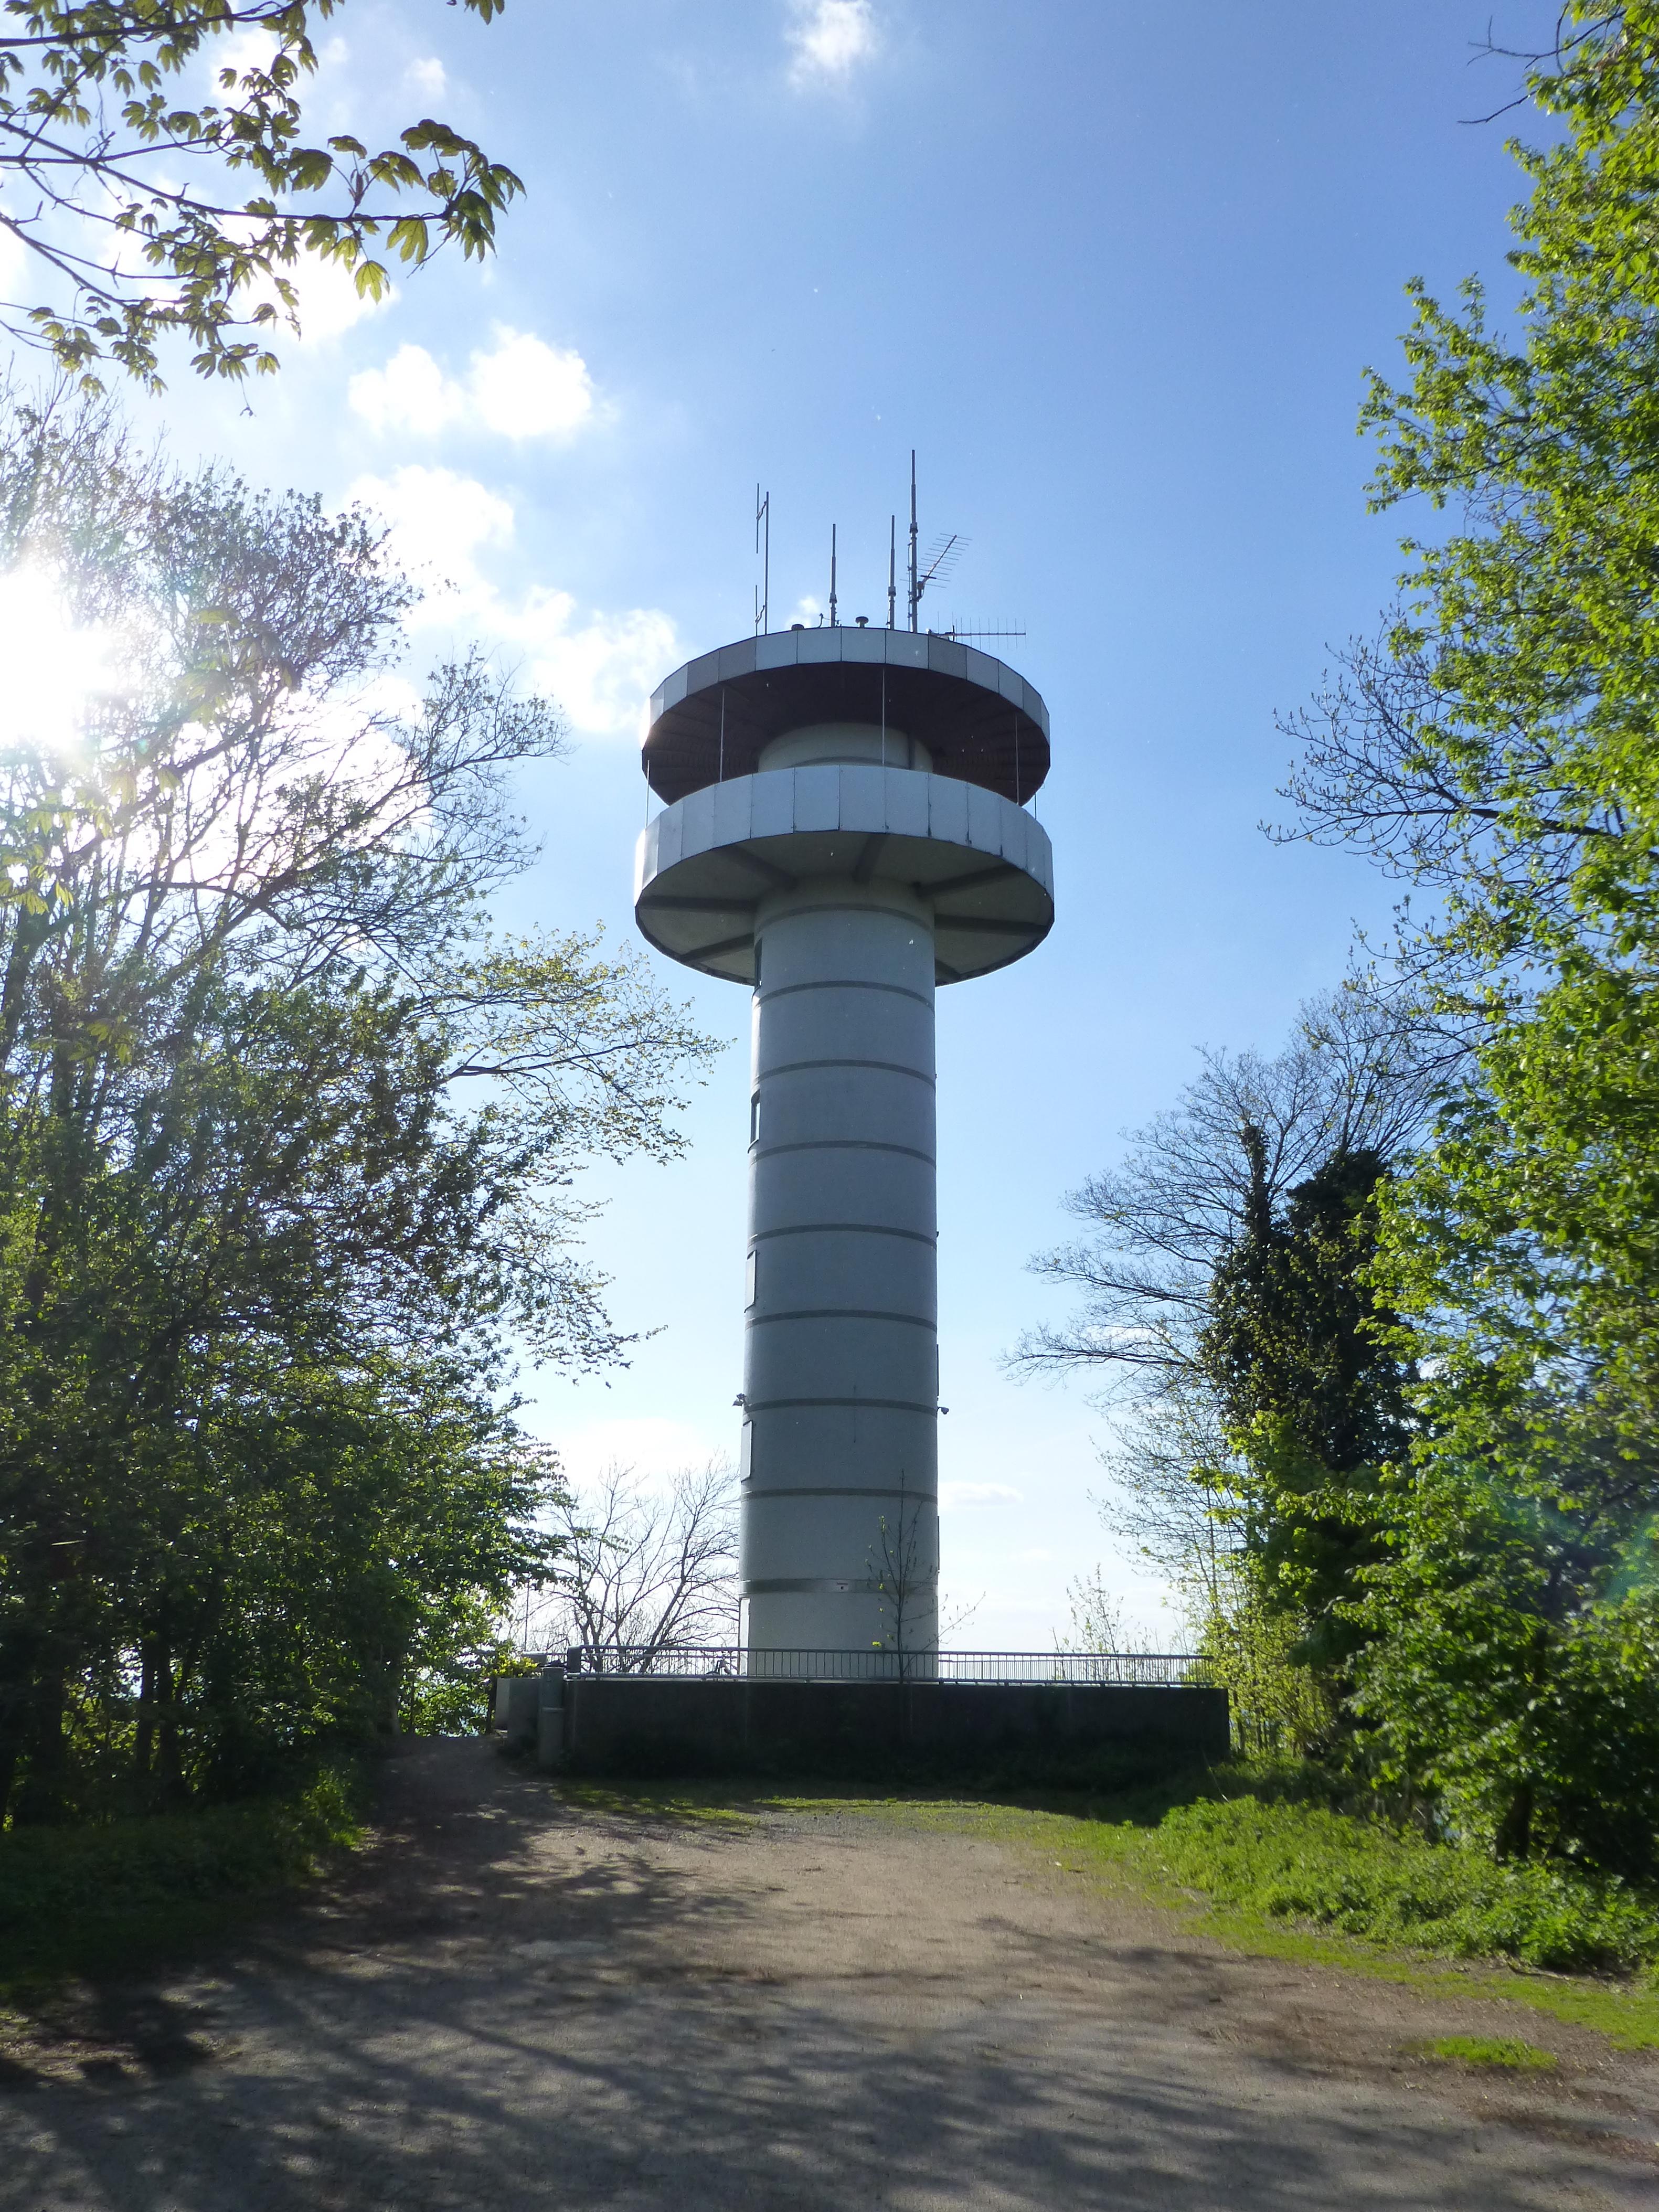 Datei:Aussichtsturm Melibokus-01.jpg